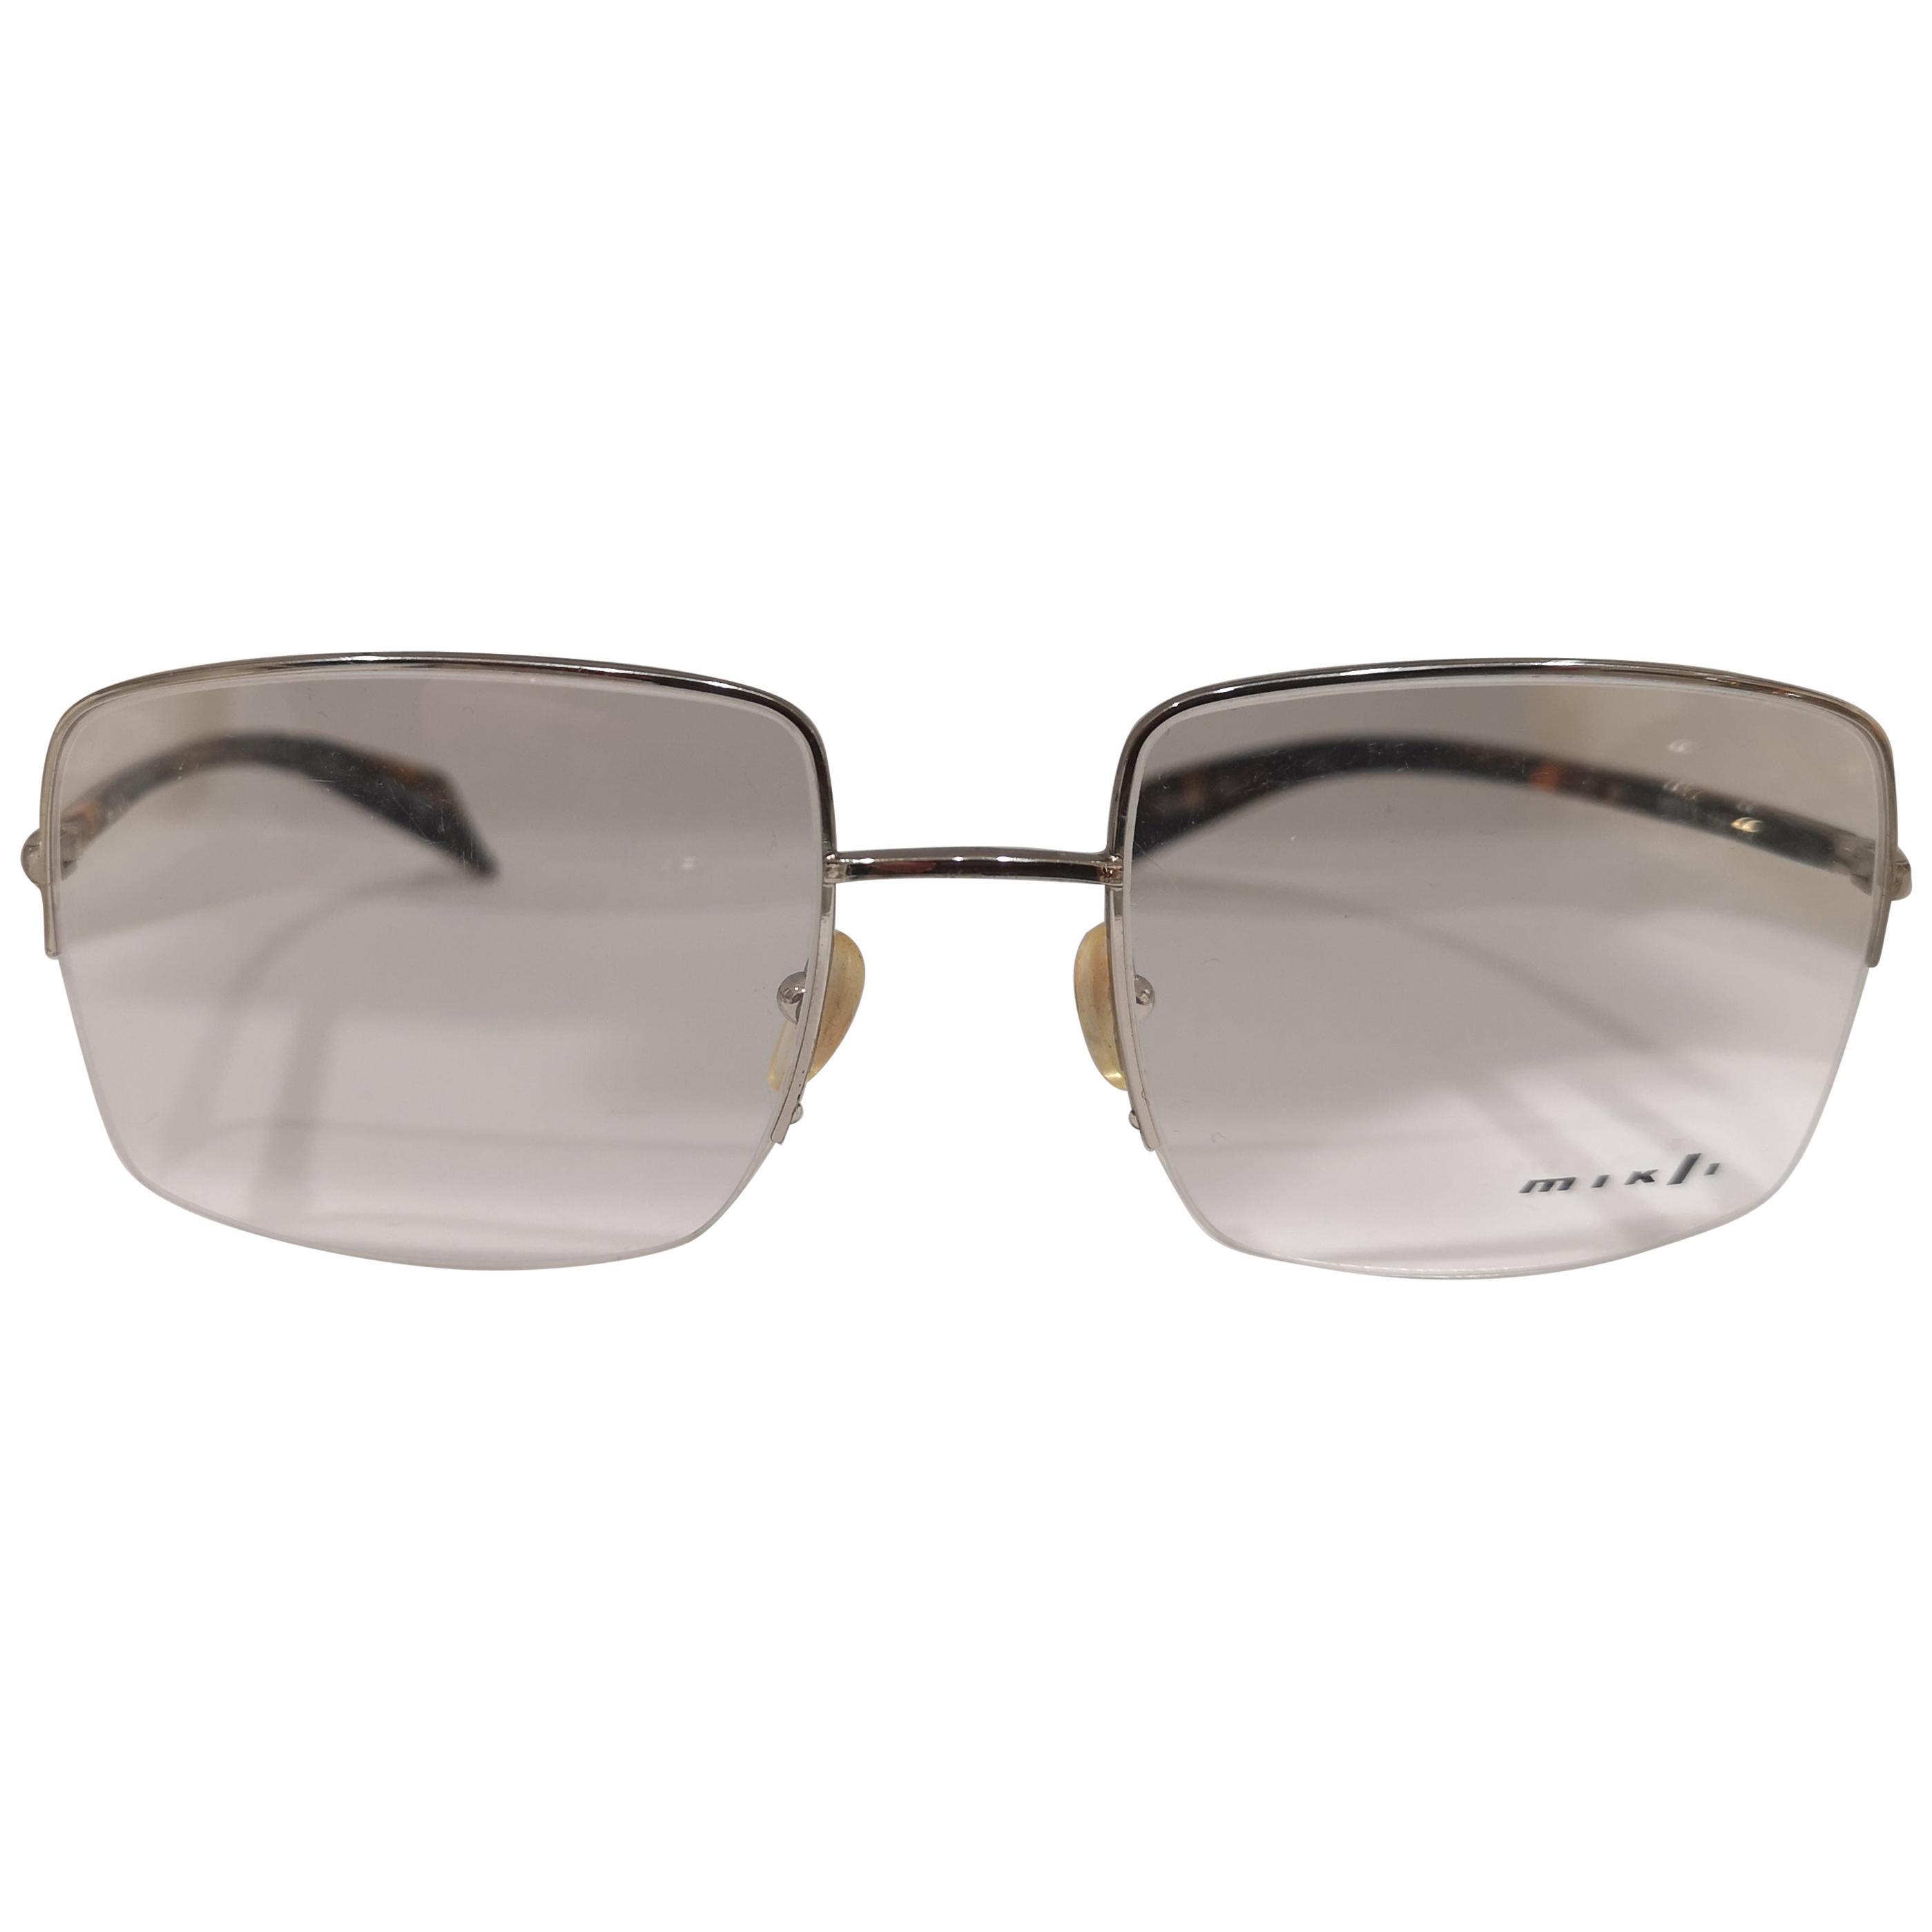 Alain Mikli frames glasses